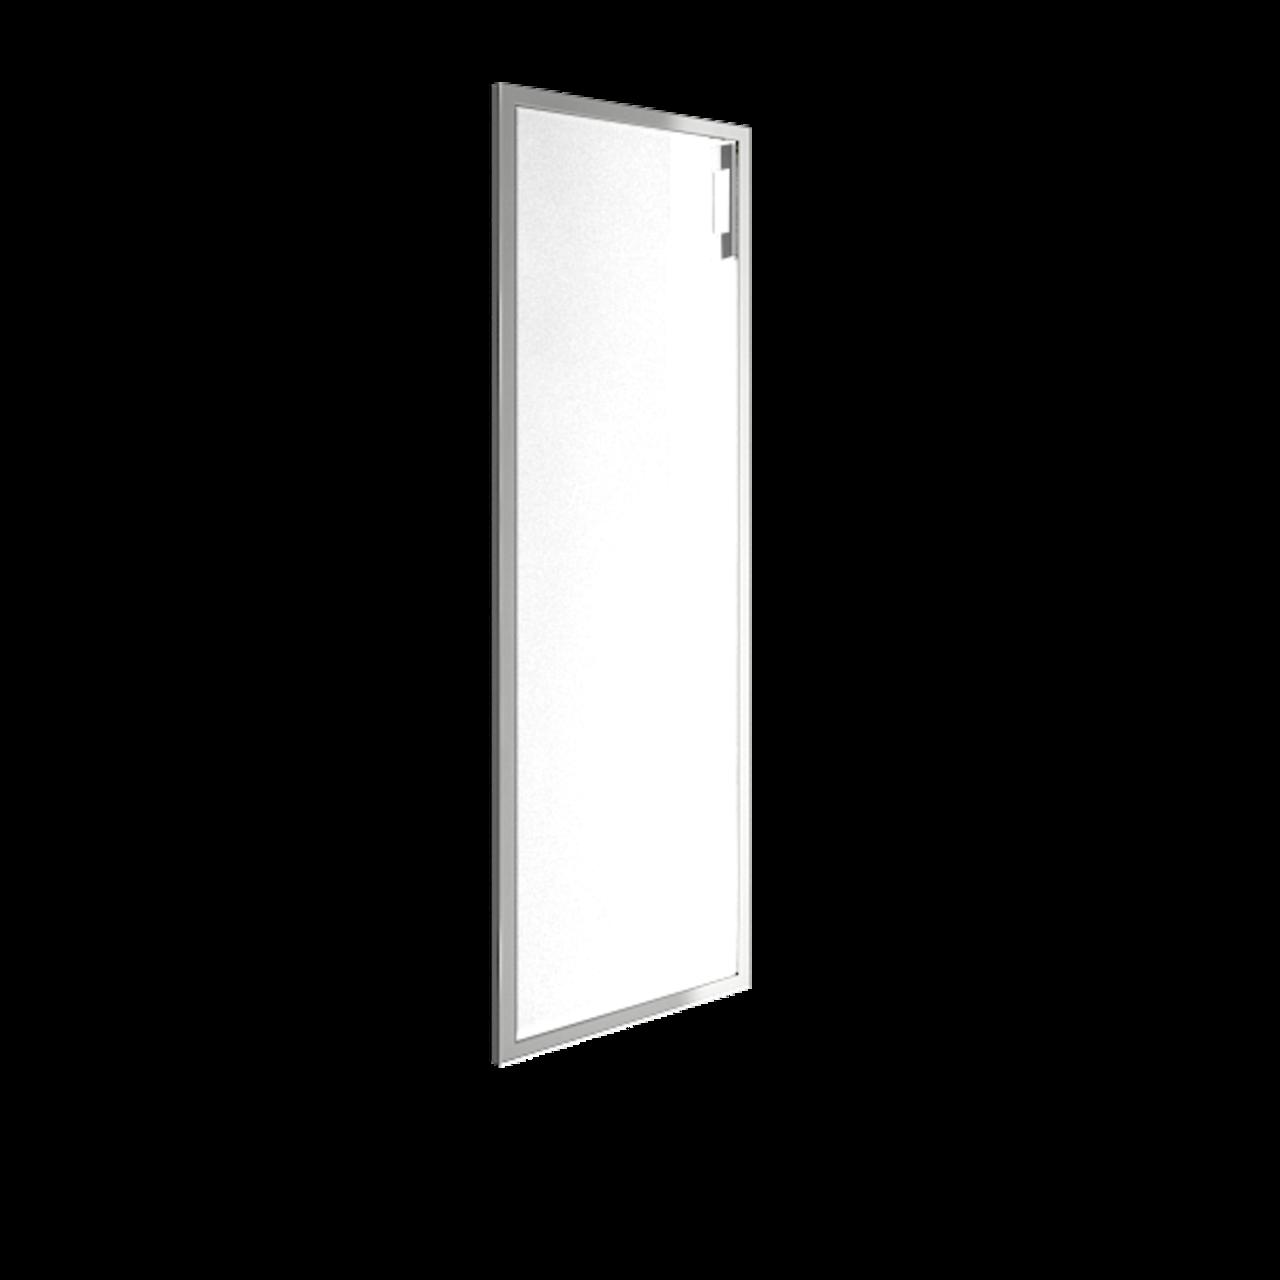 Дверь стекло в раме среднее Lacobel white левая - фото 5